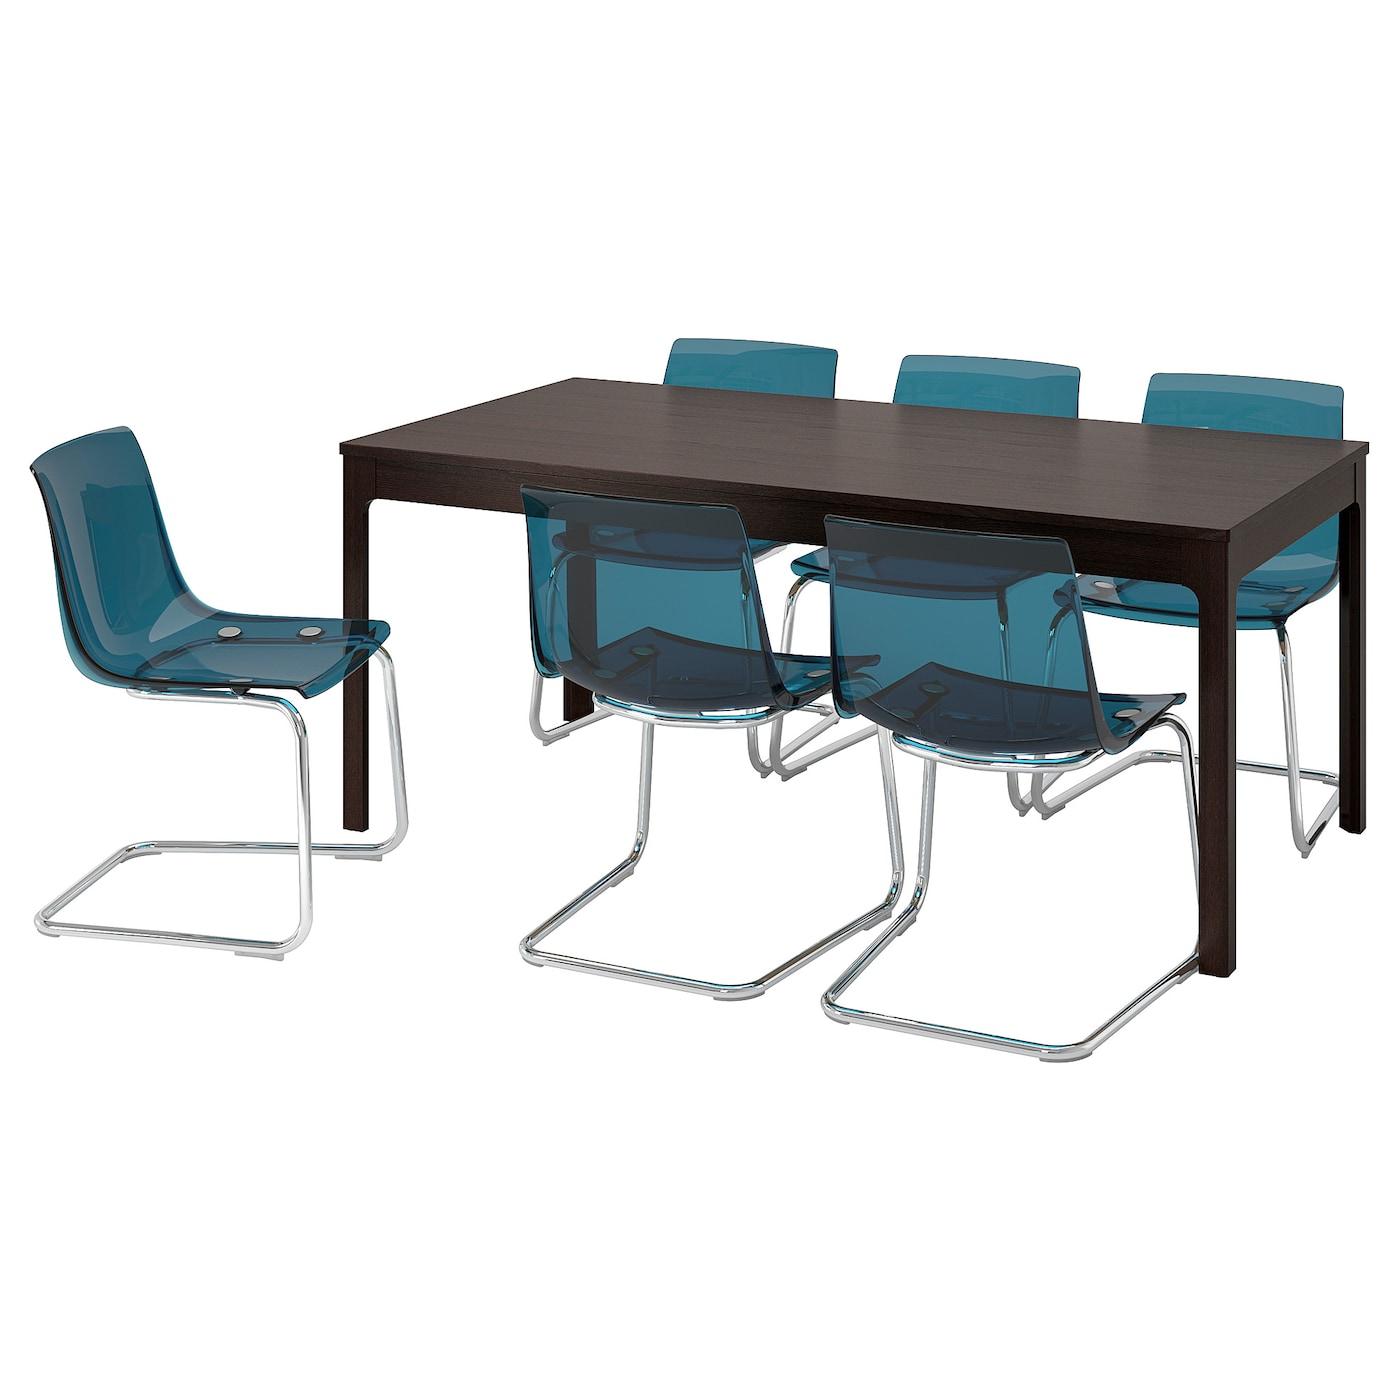 EKEDALEN TOBIAS Bord och 6 stolar mörkbrunblå 180240 cm